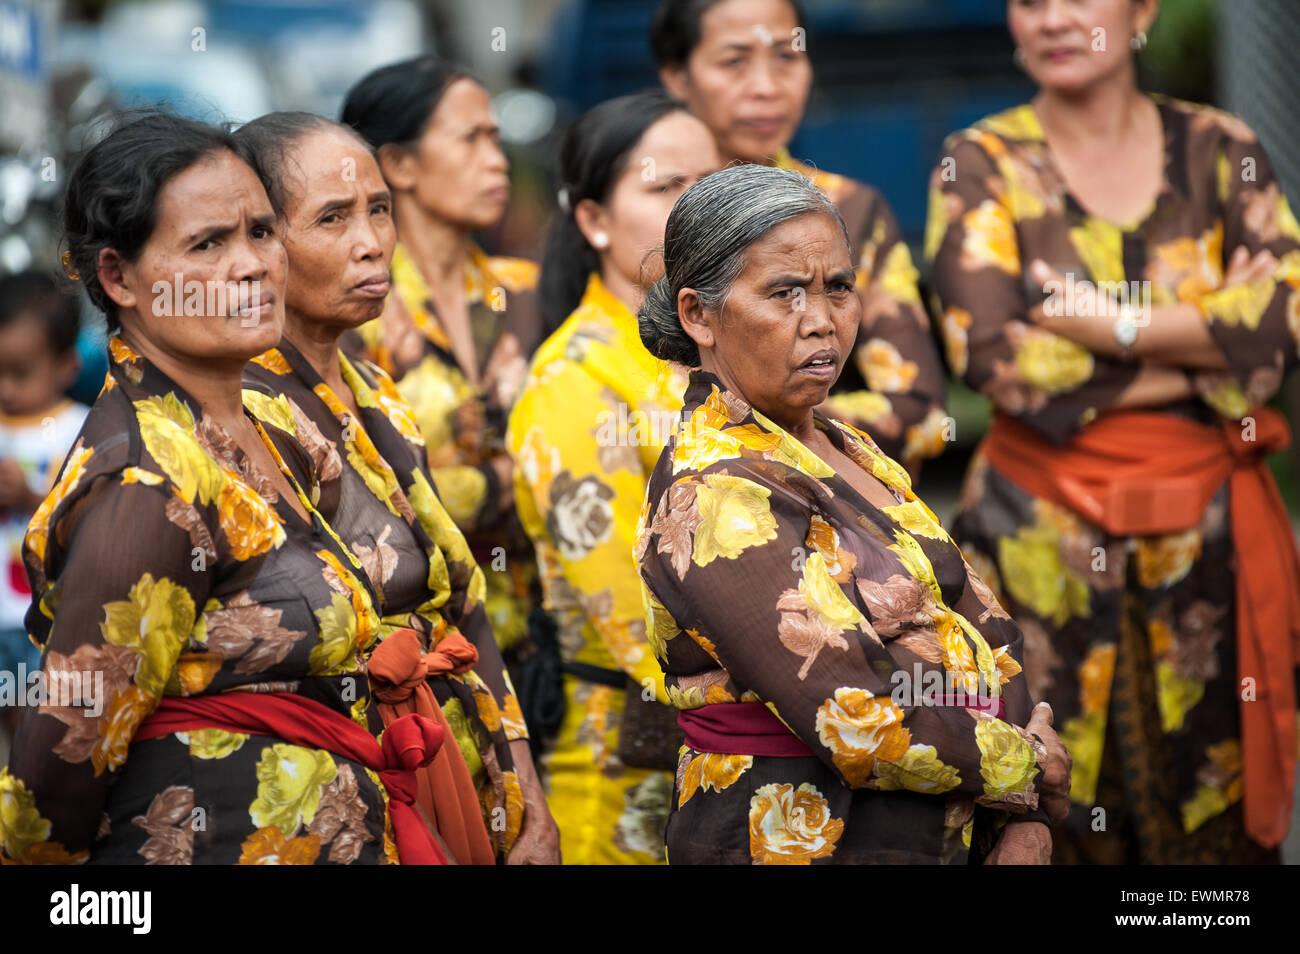 Funeral ceremony for Tjokorda Putra Dharma Yudha at Ubud, Bali, Indonesia, 28/7/2012. - Stock Image